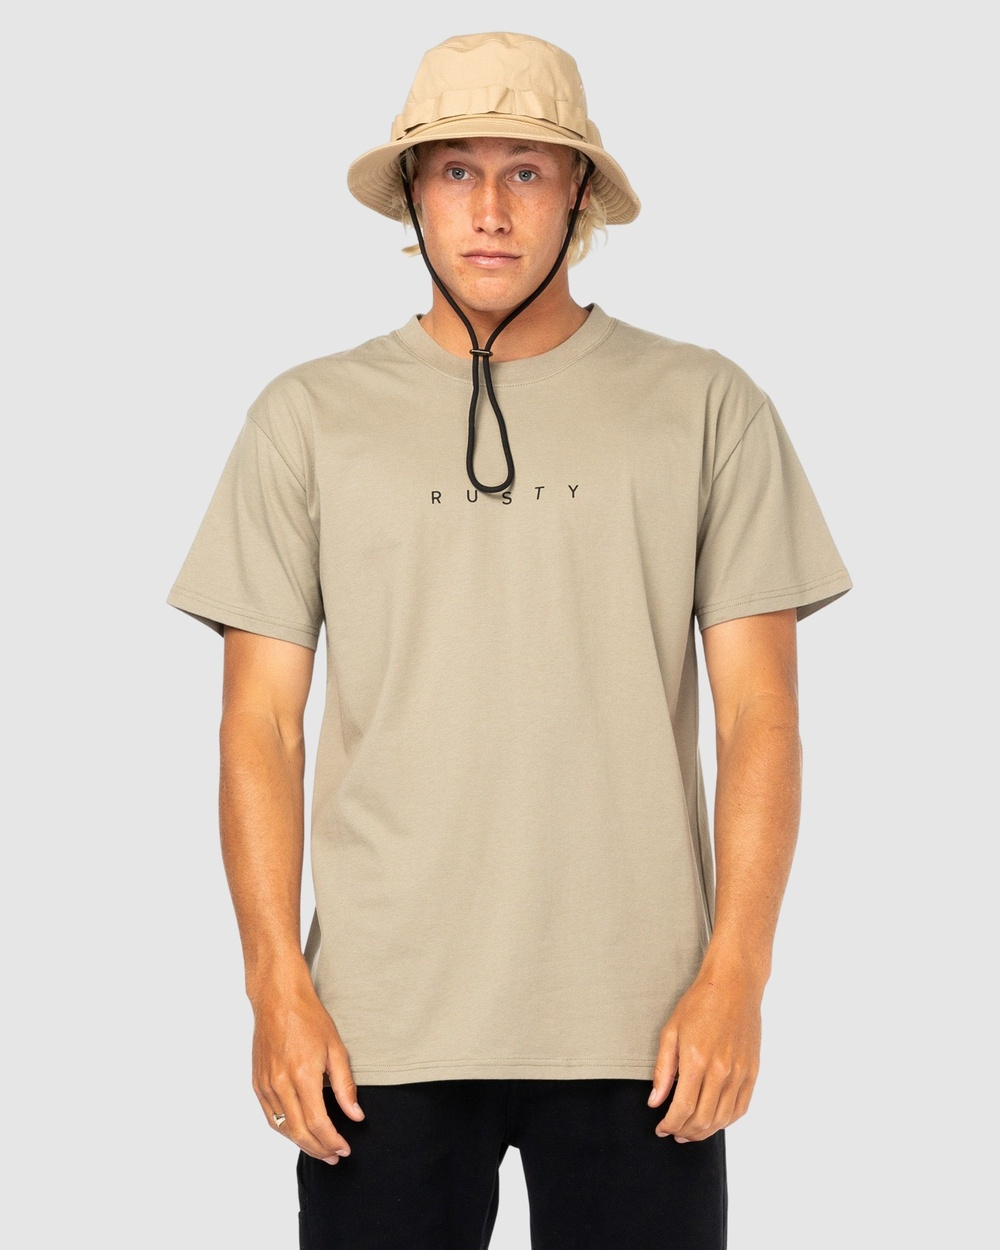 Rusty Short Cut Sleeve Tee T-Shirts CVG Australia